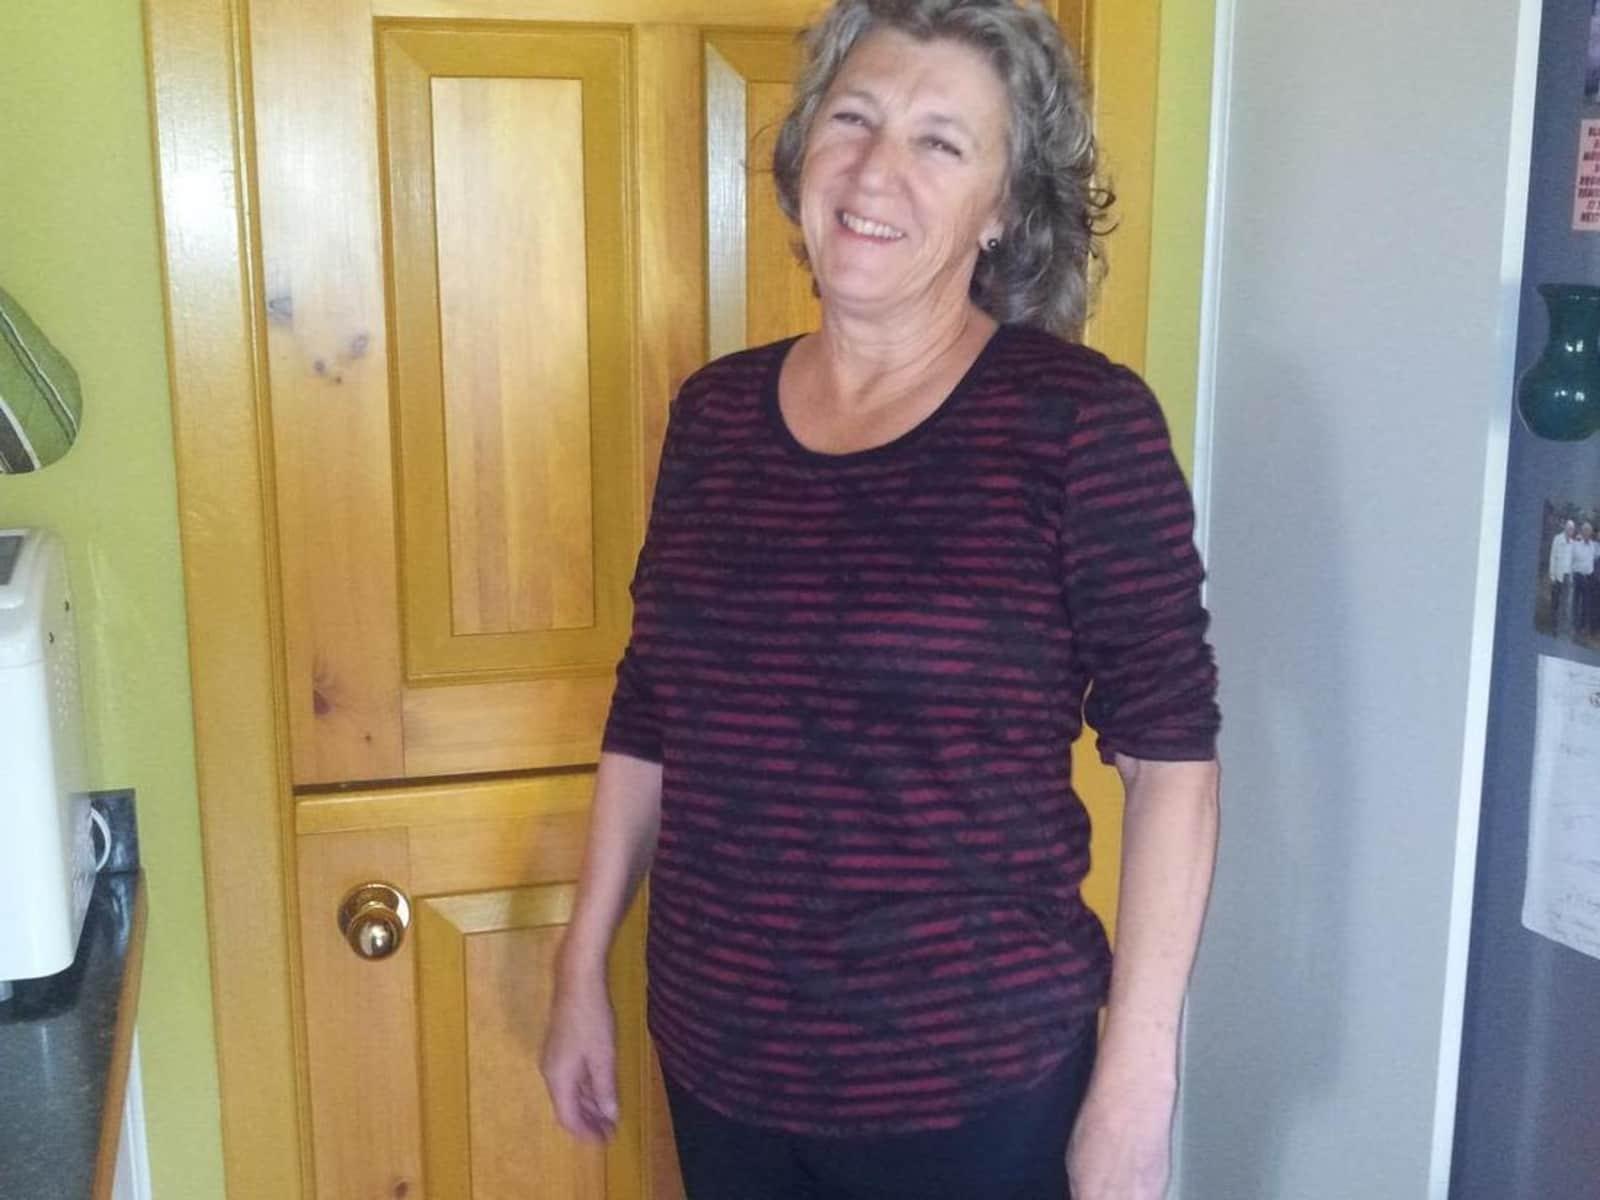 Shirley from Kamloops, British Columbia, Canada